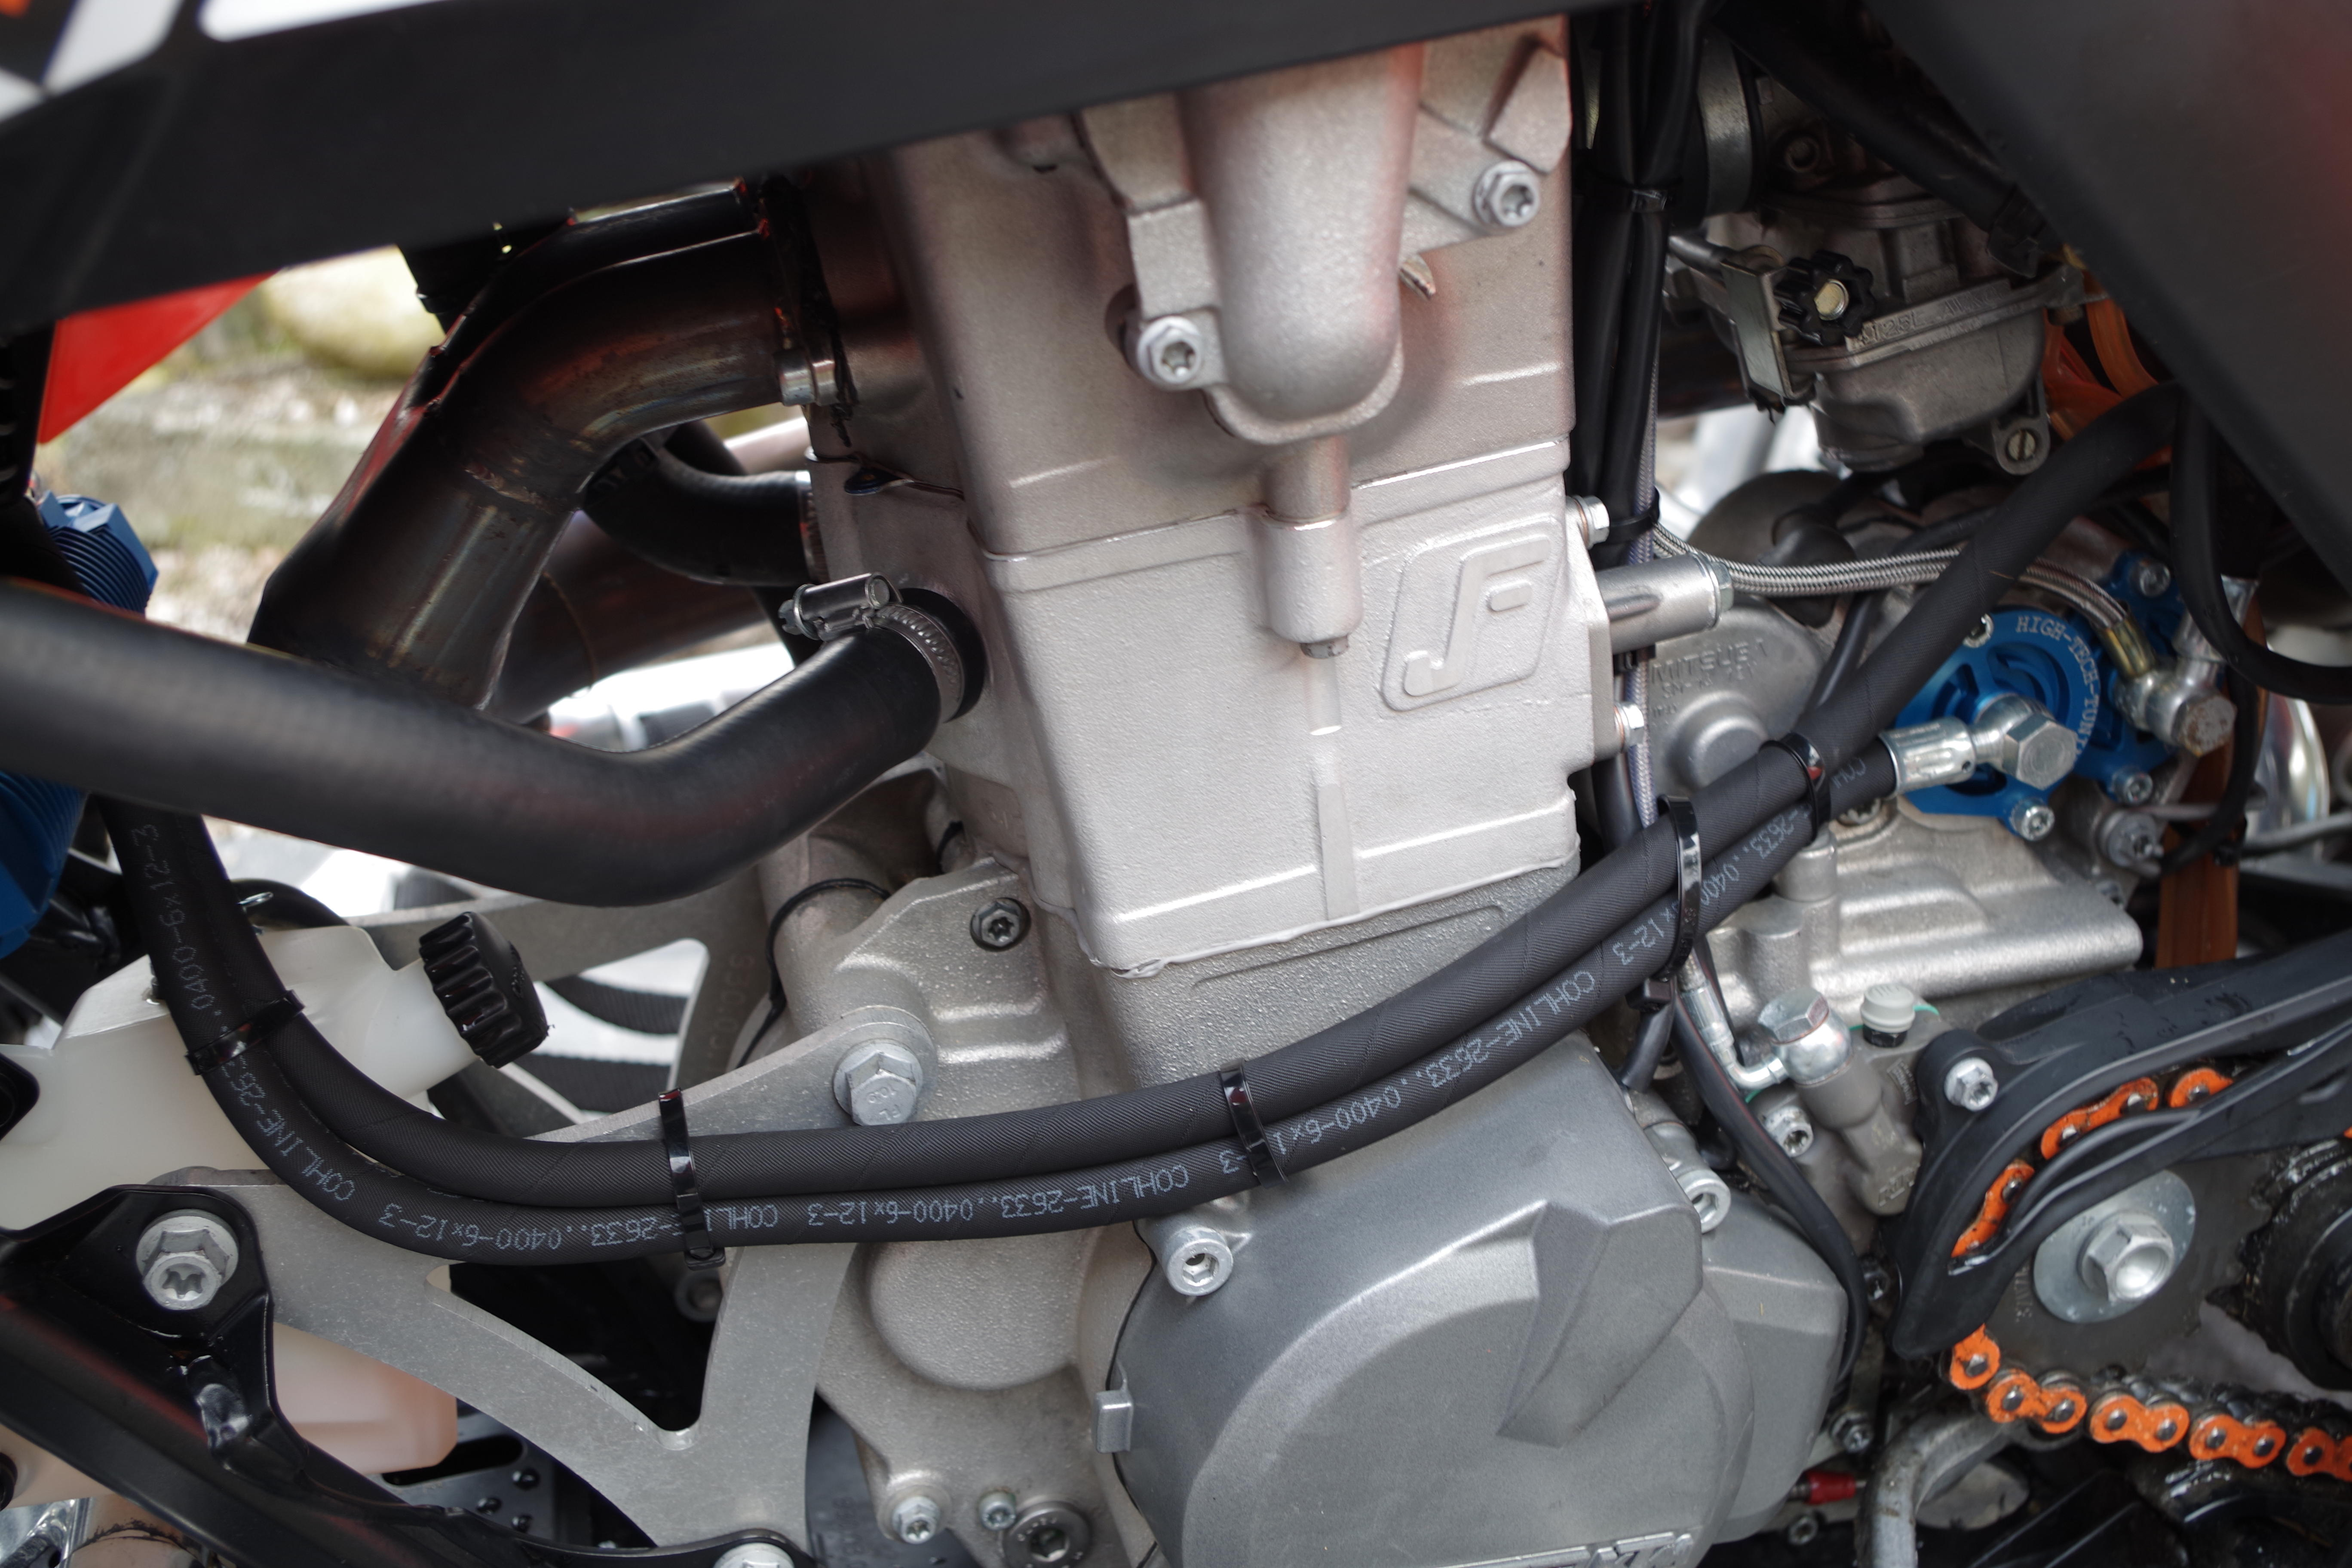 KTM 450 xc, 662 ccm, 41mm, KTMBill, 74 HP!!!-imgp0170.jpg